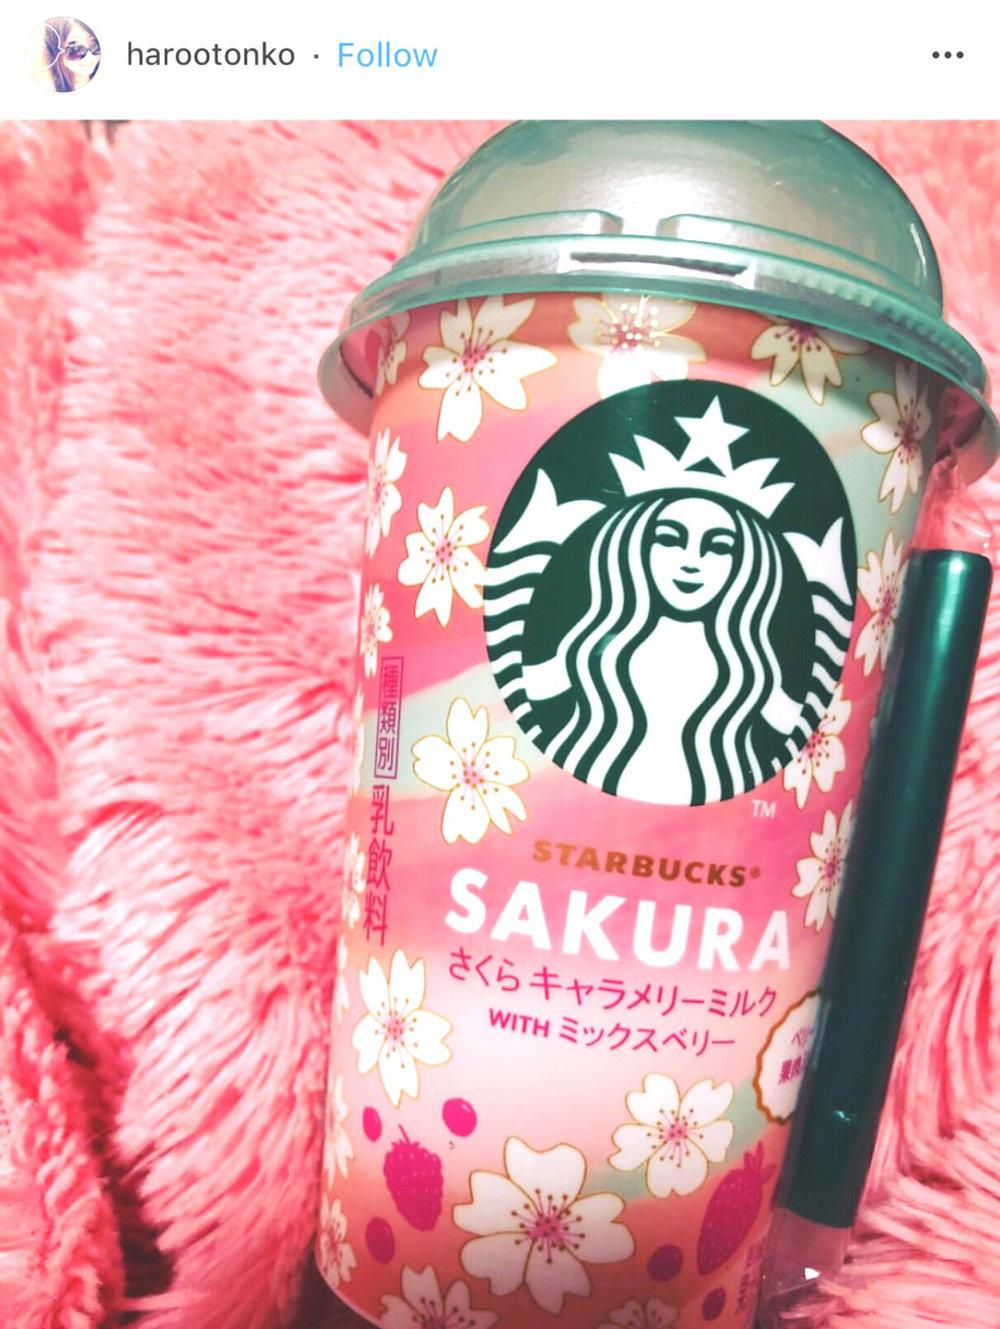 SakuraChillCup_IG_2.jpg